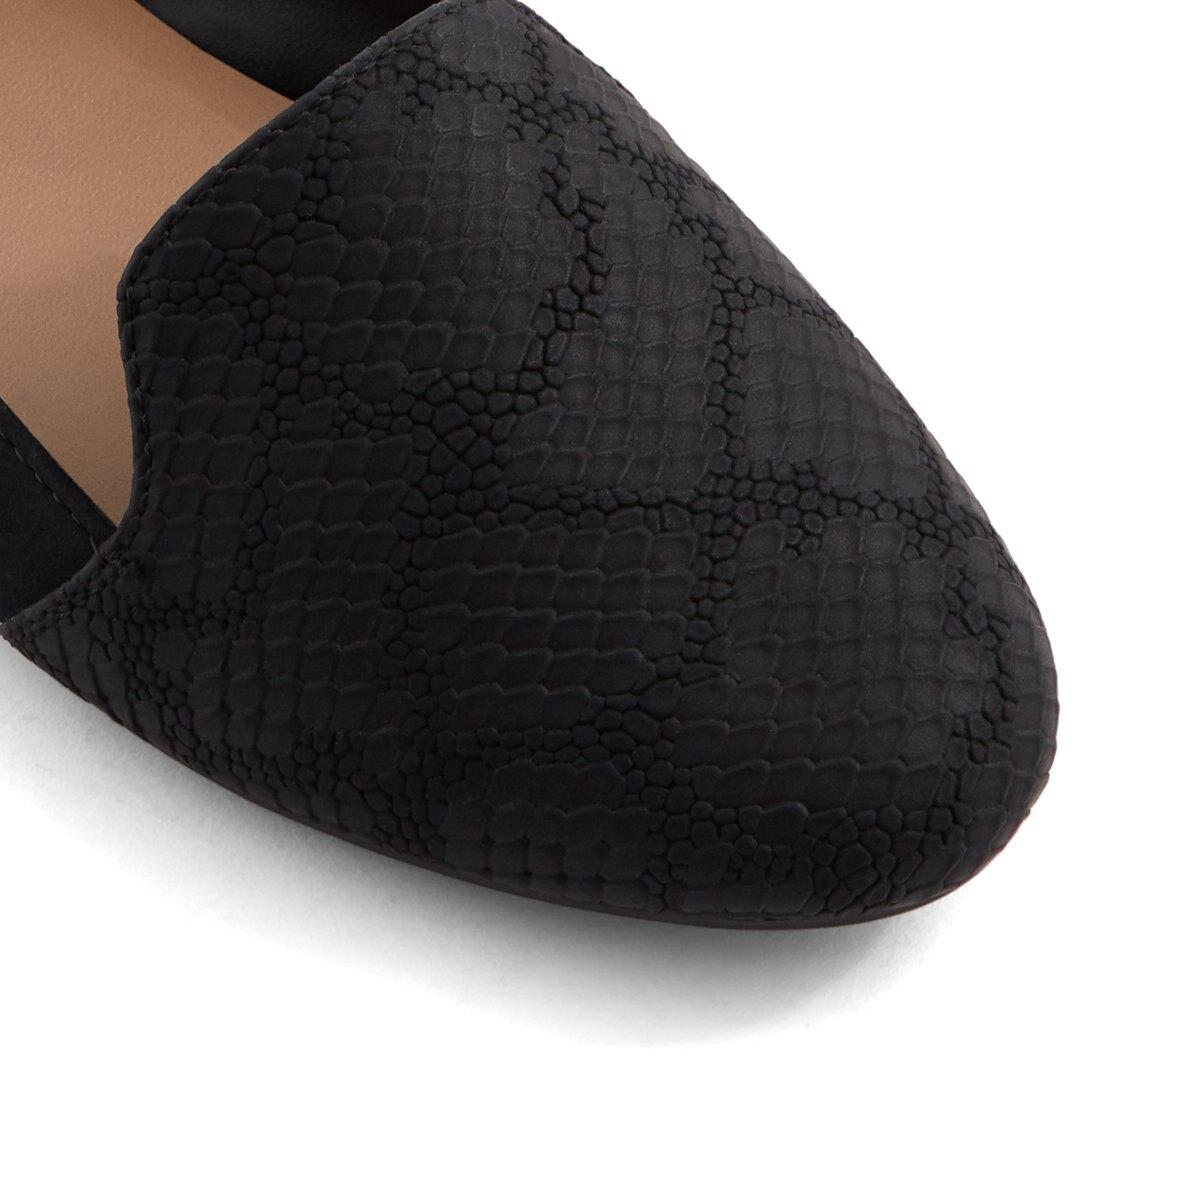 dcdcf22939 Pirita Black Women s Loafers